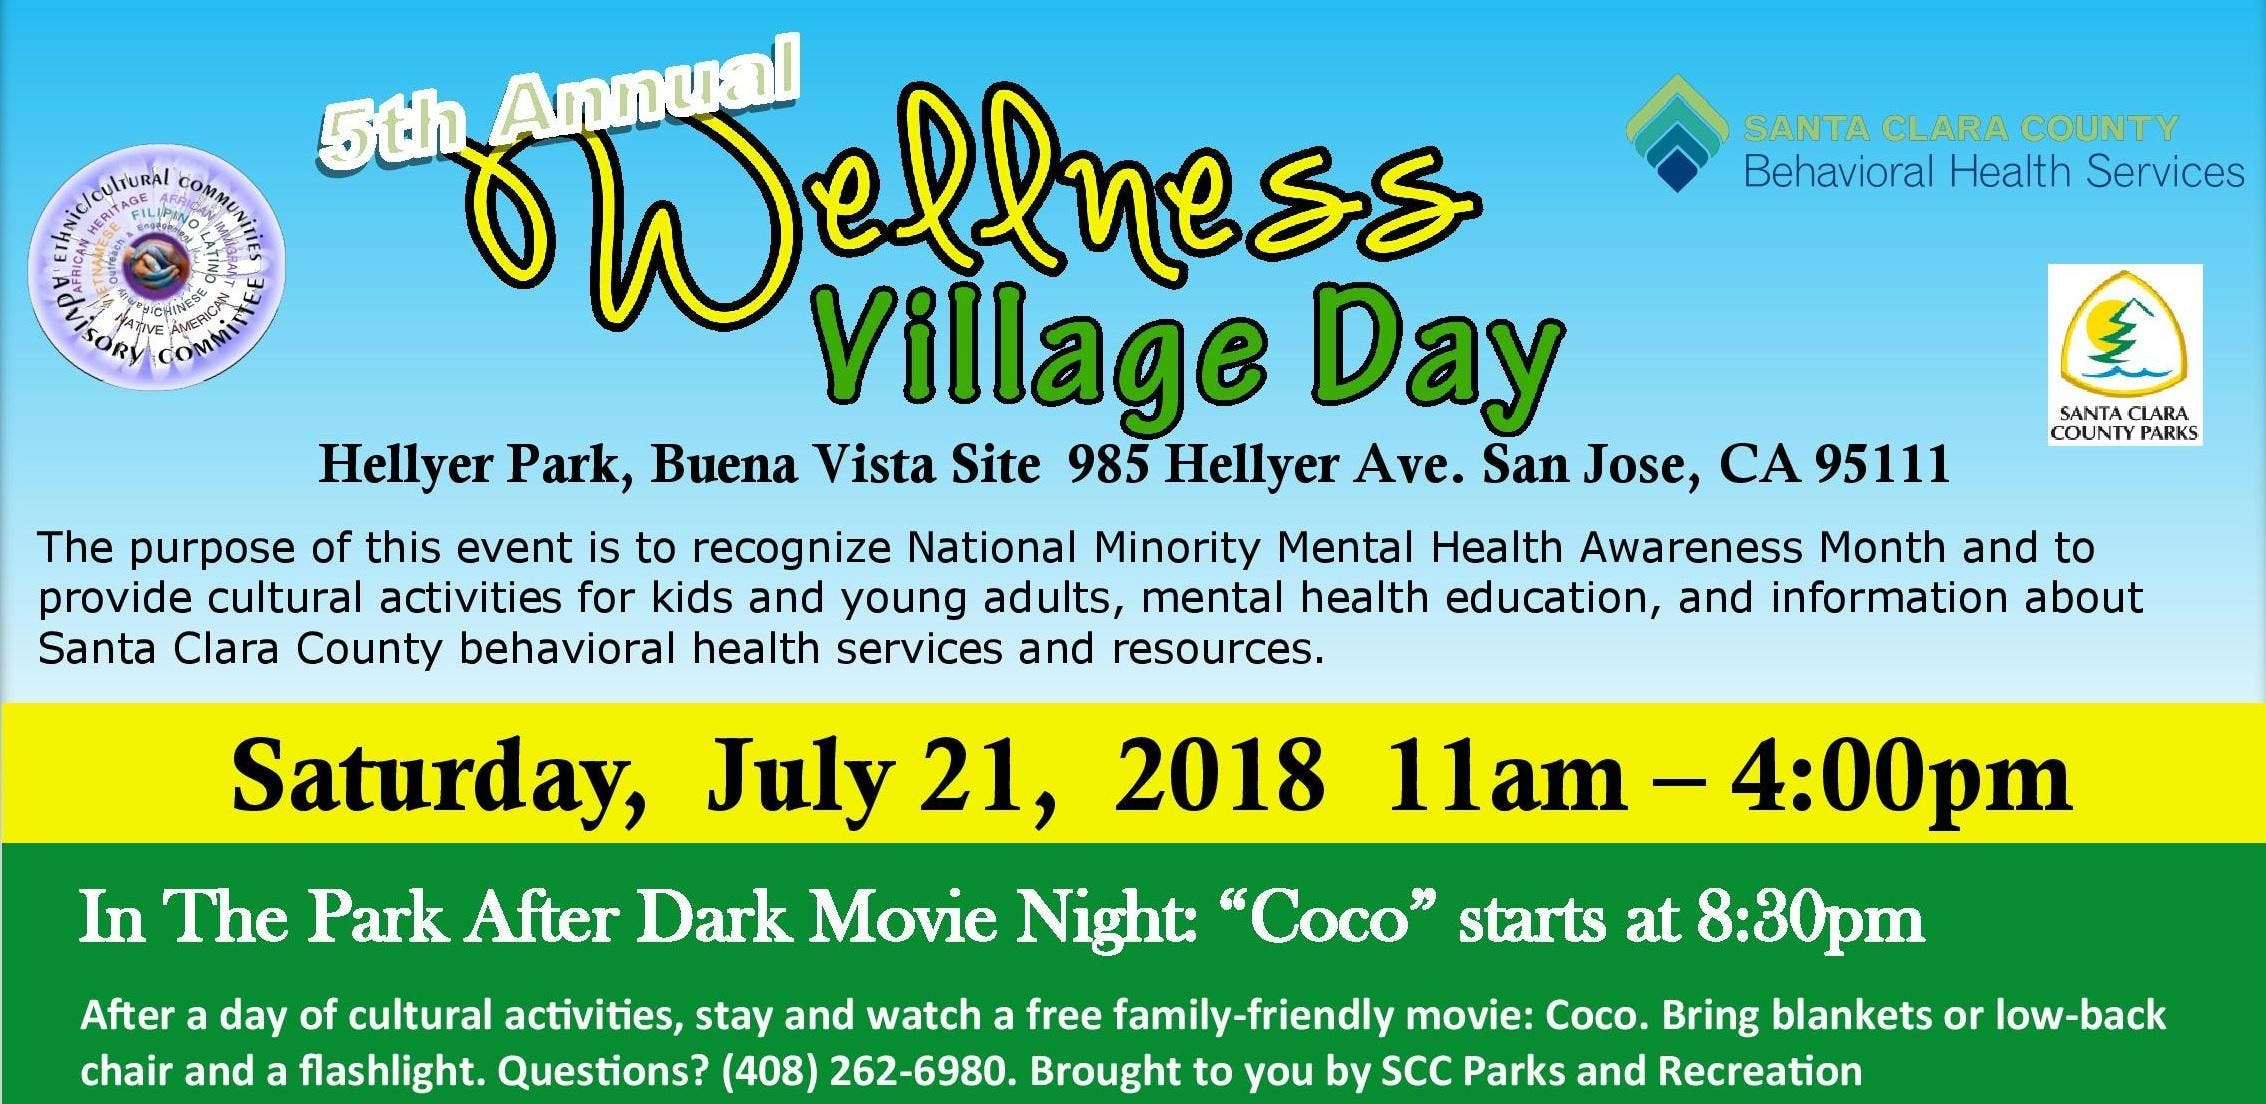 5th Annual Wellness Village Day At Hellyer Park Buena Vista Site